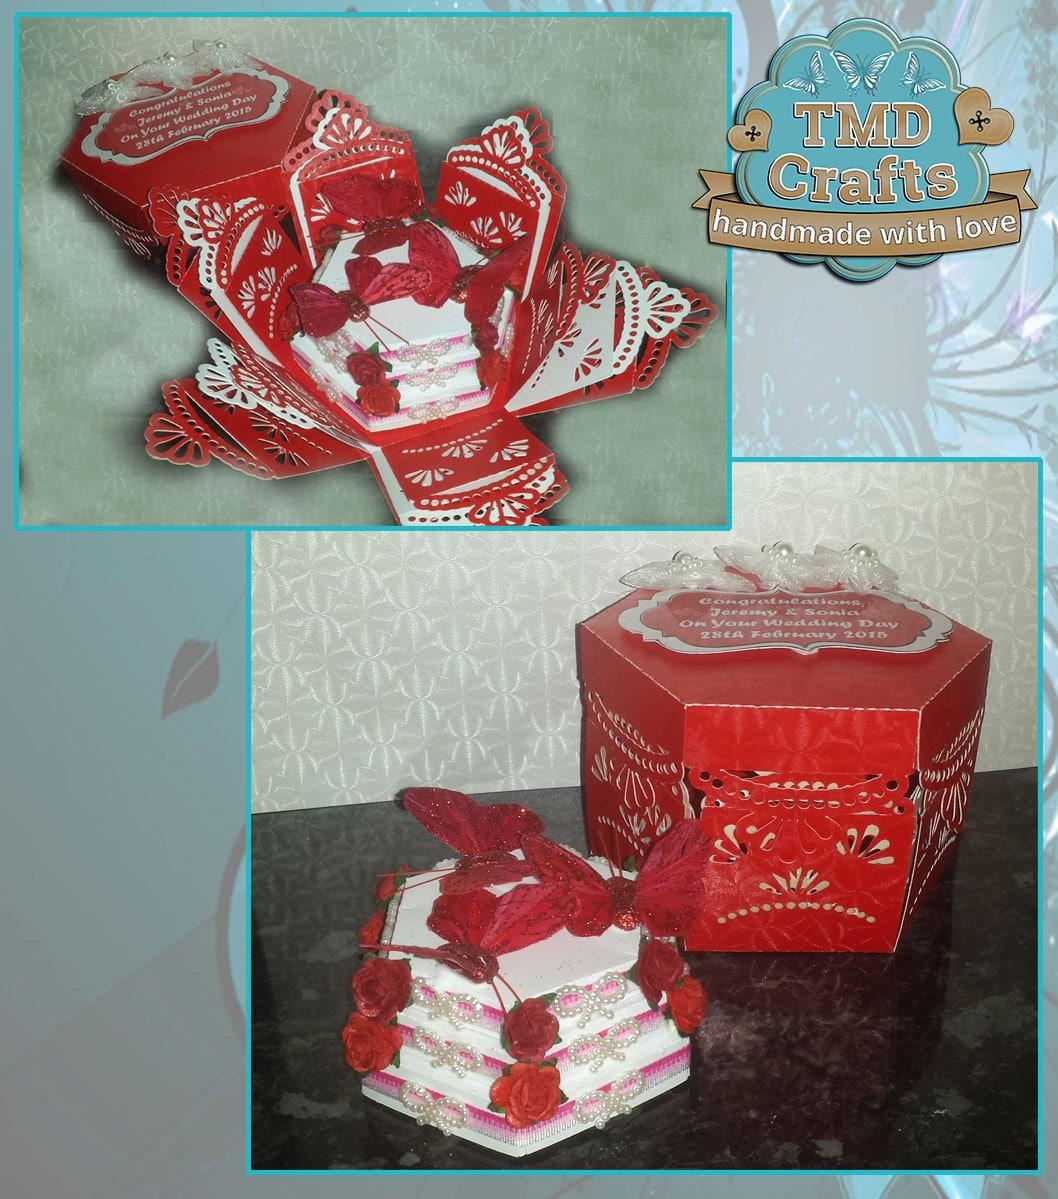 3 Tier Wedding Cake in Exploding Box